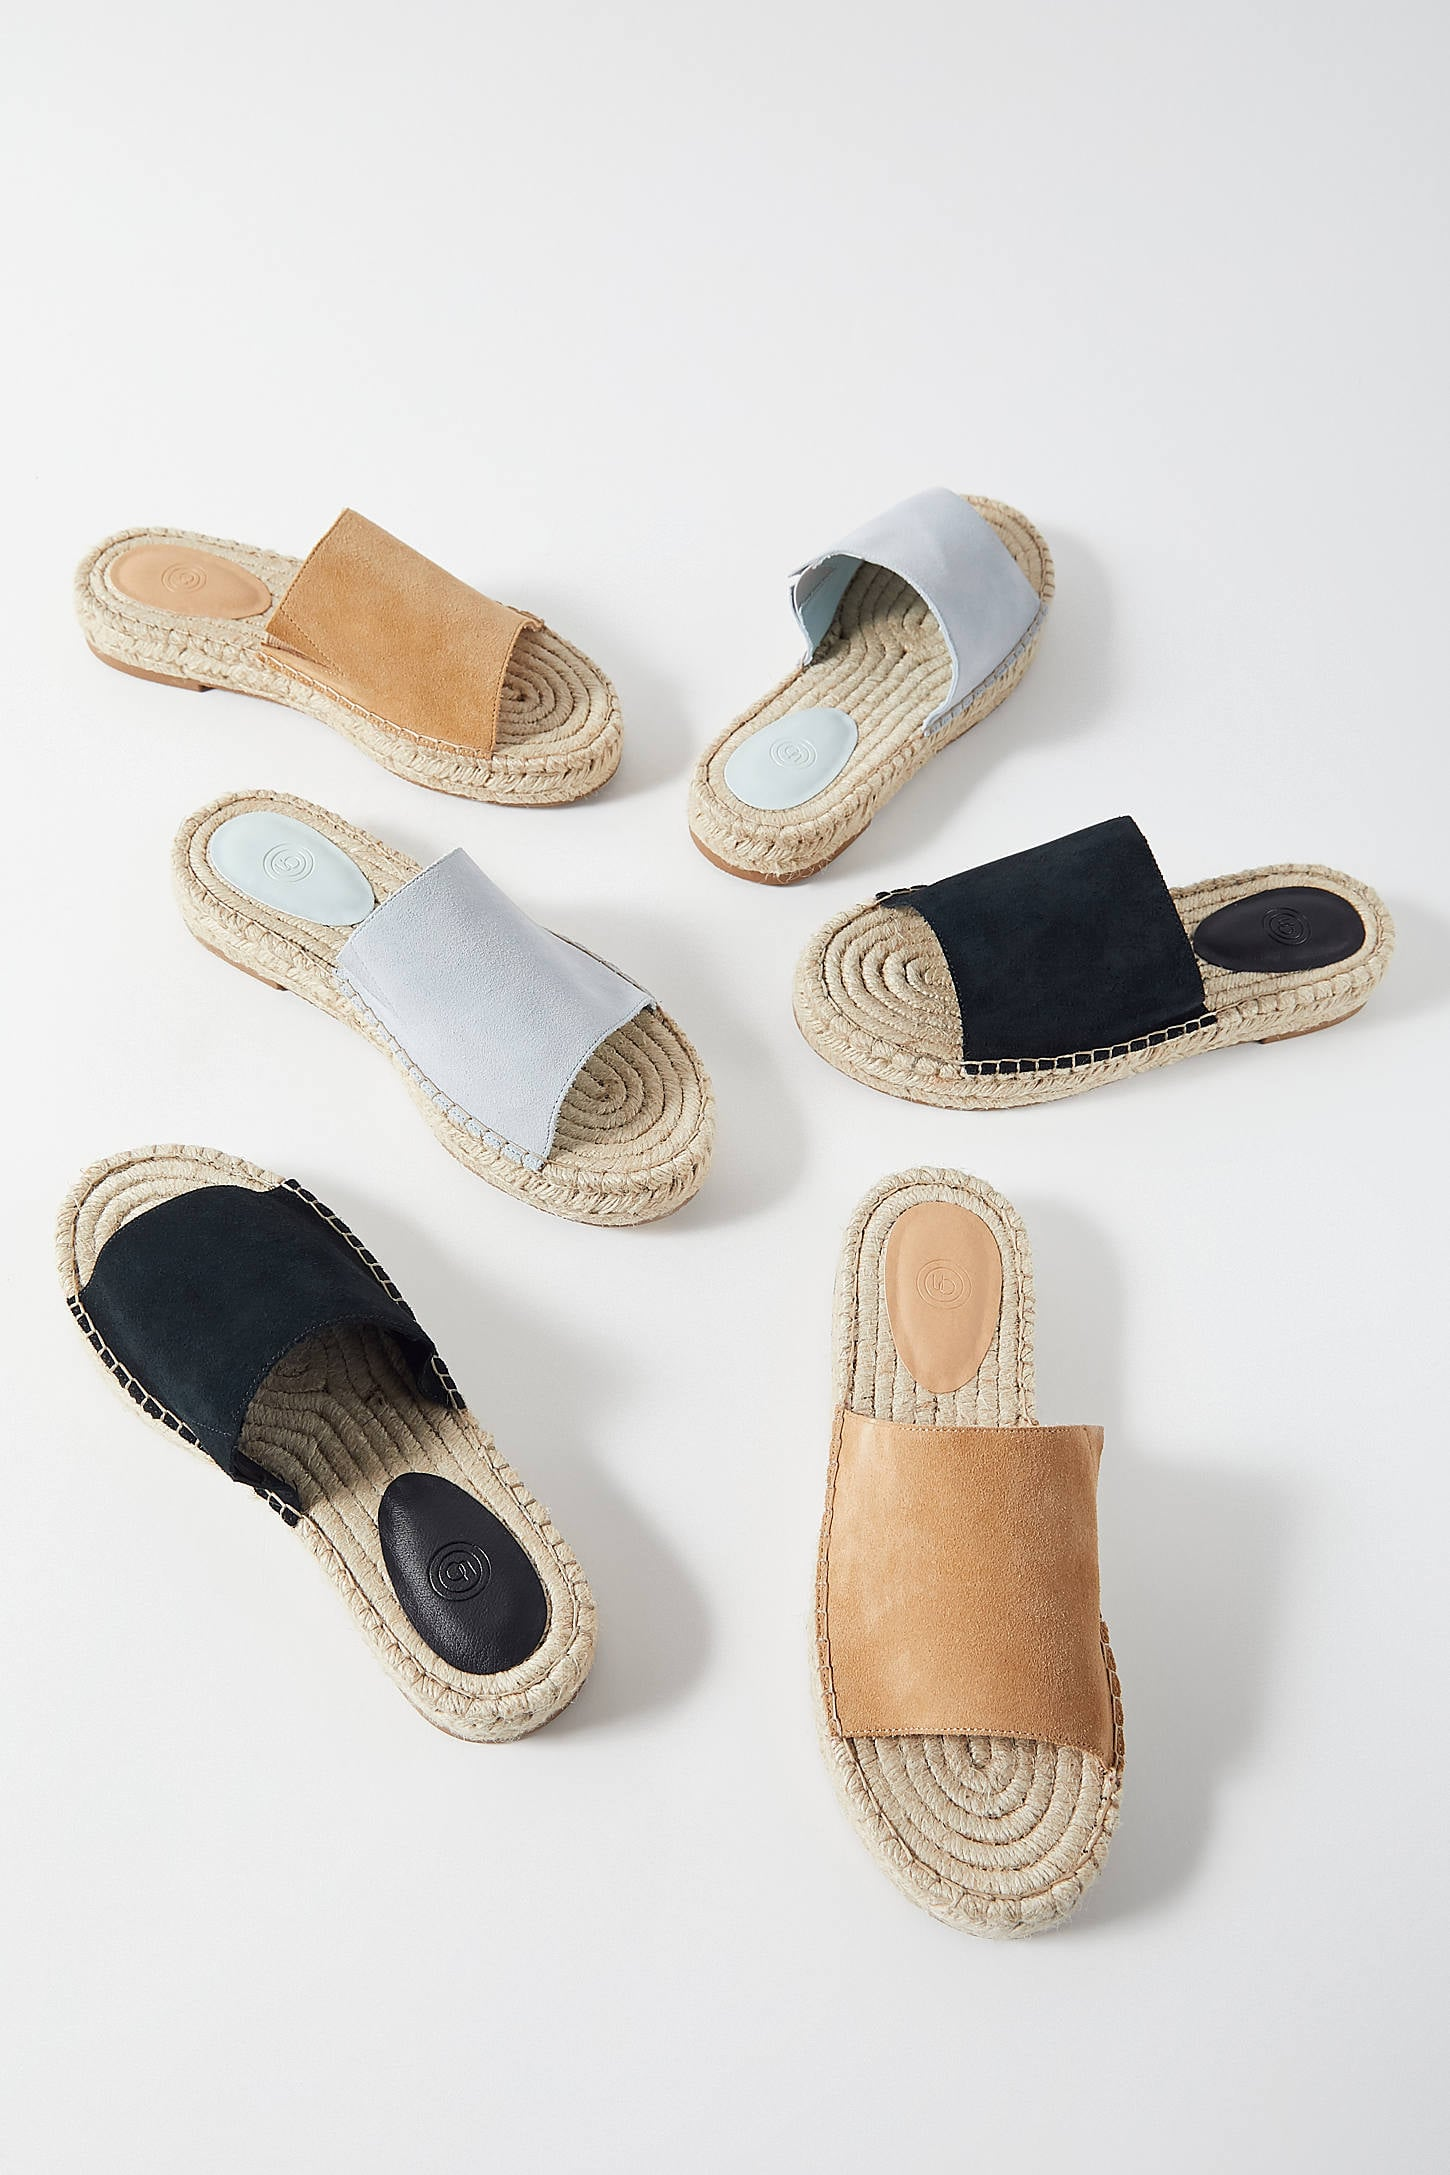 Best Espadrille Shoes For Women 2020